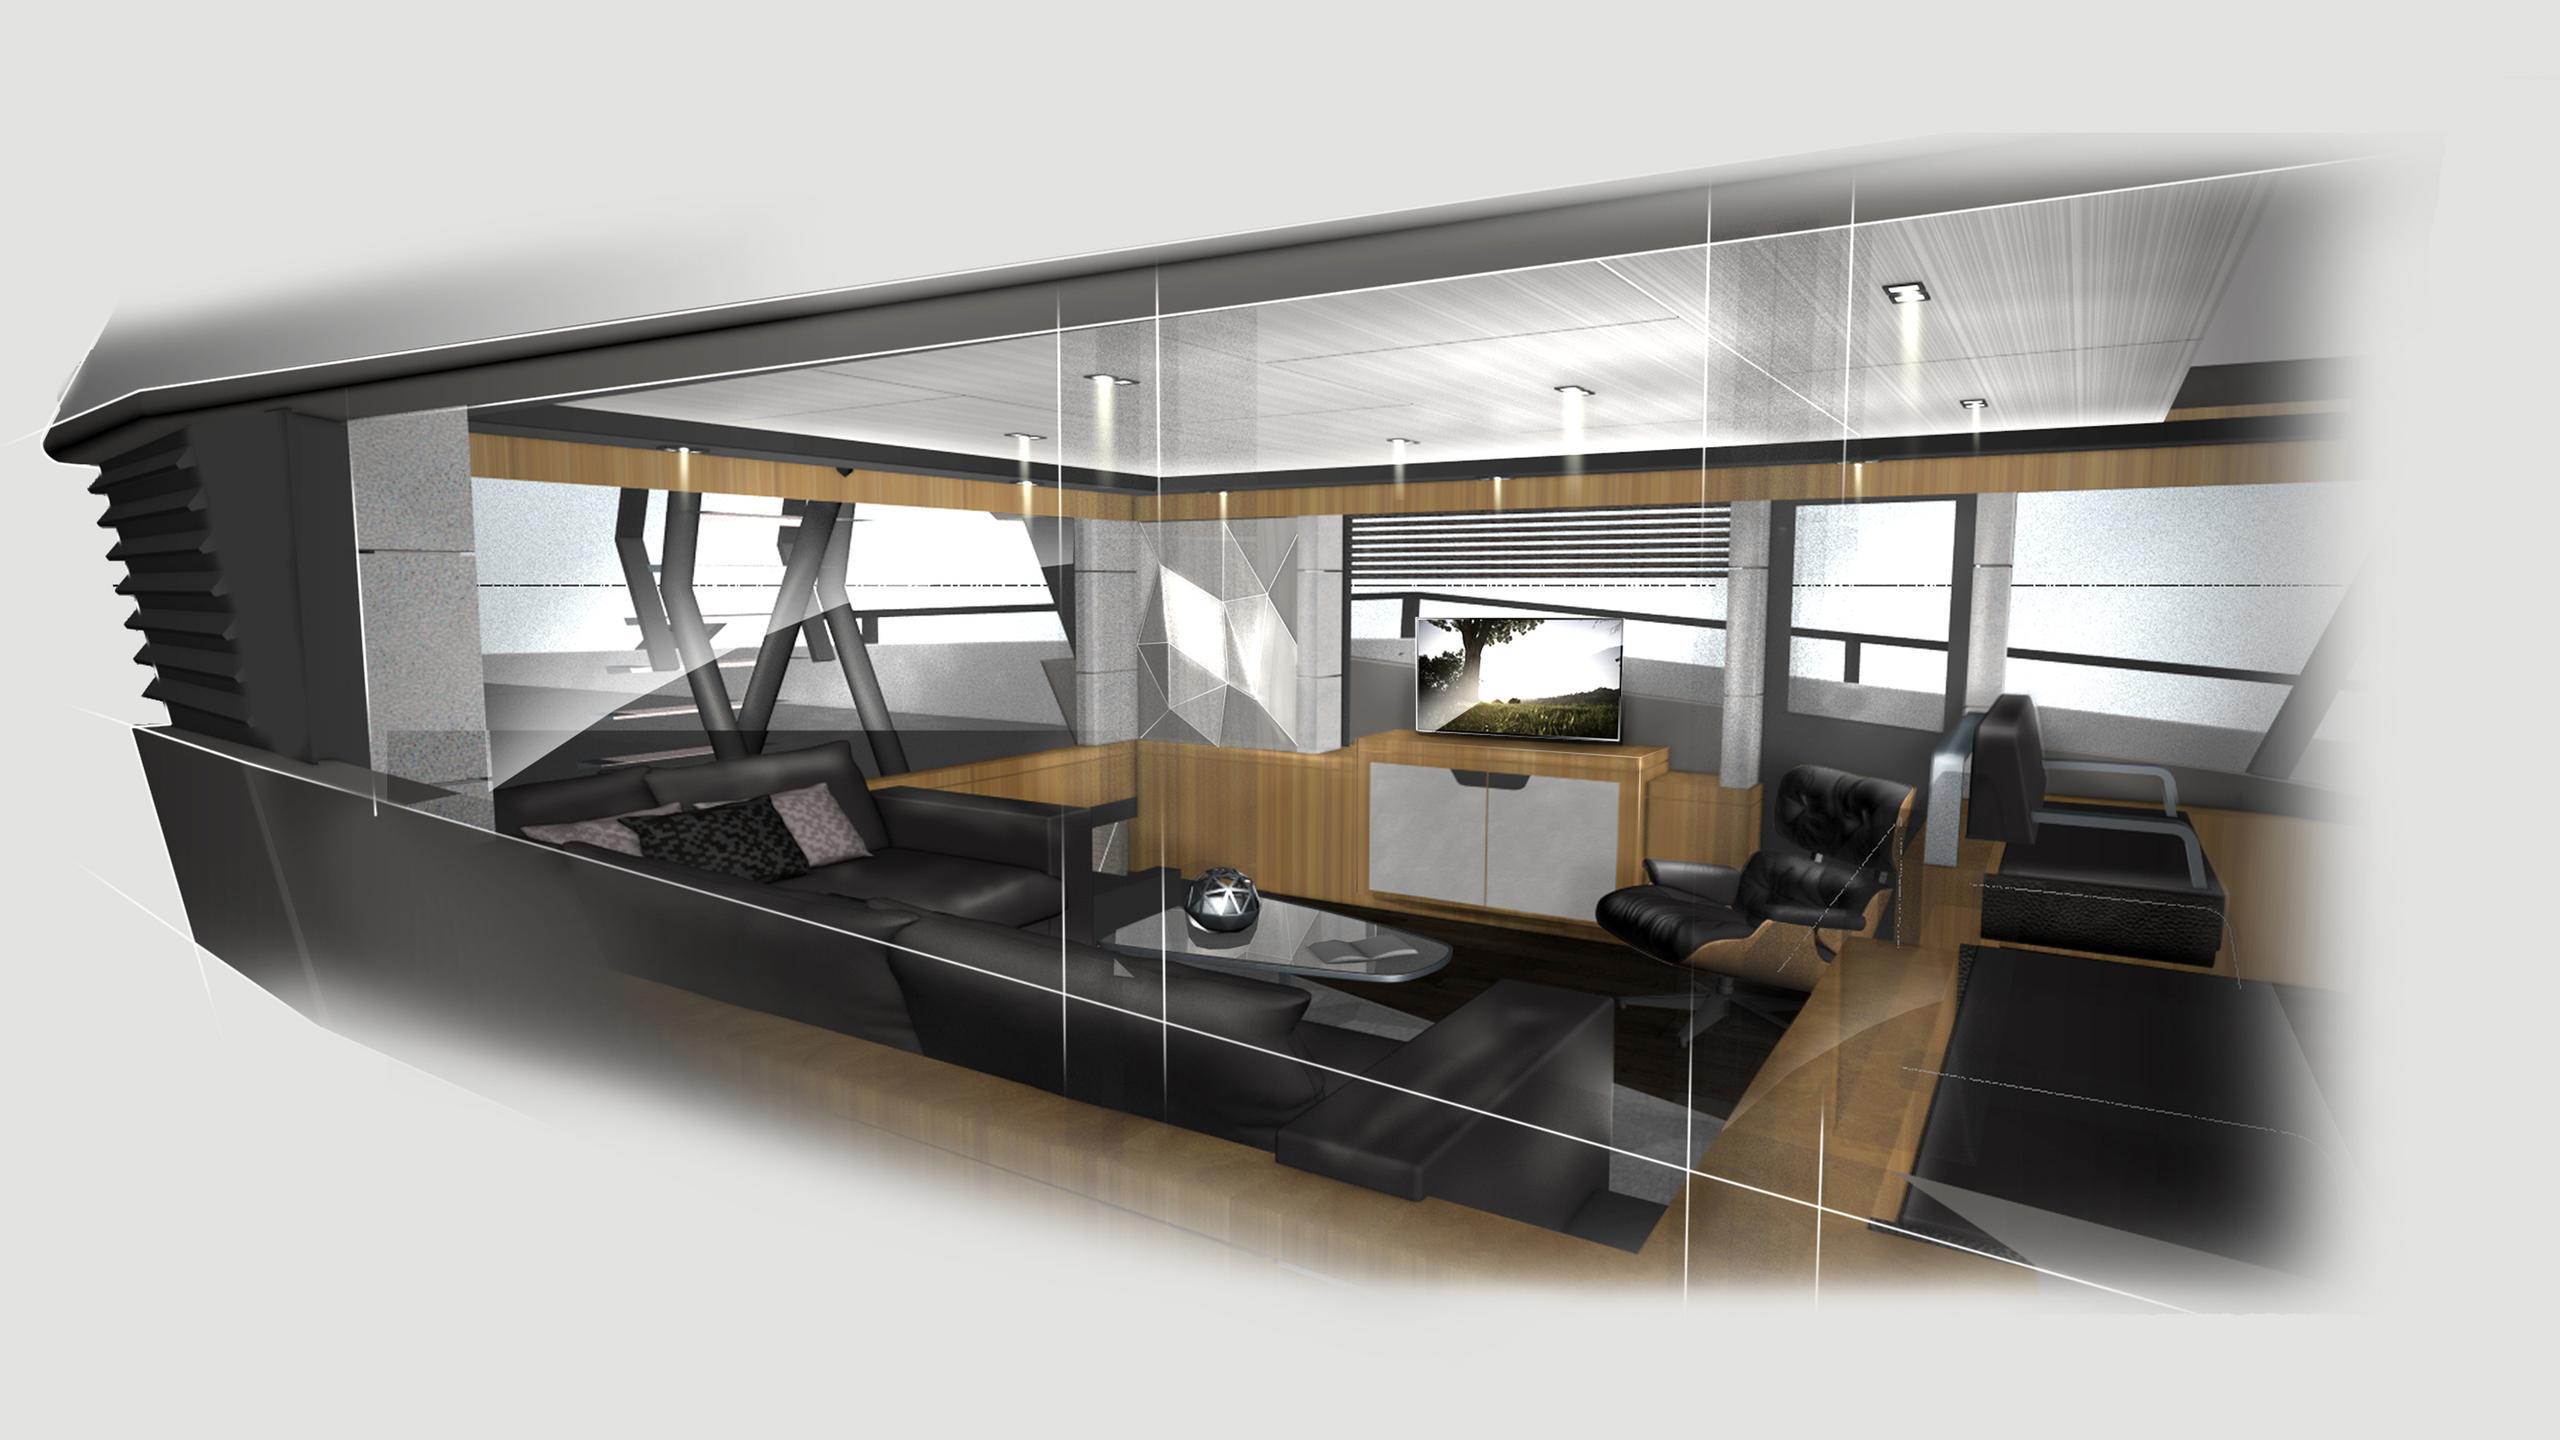 rock motoryacht evadne yachts 24m 2018 rendering skylounge